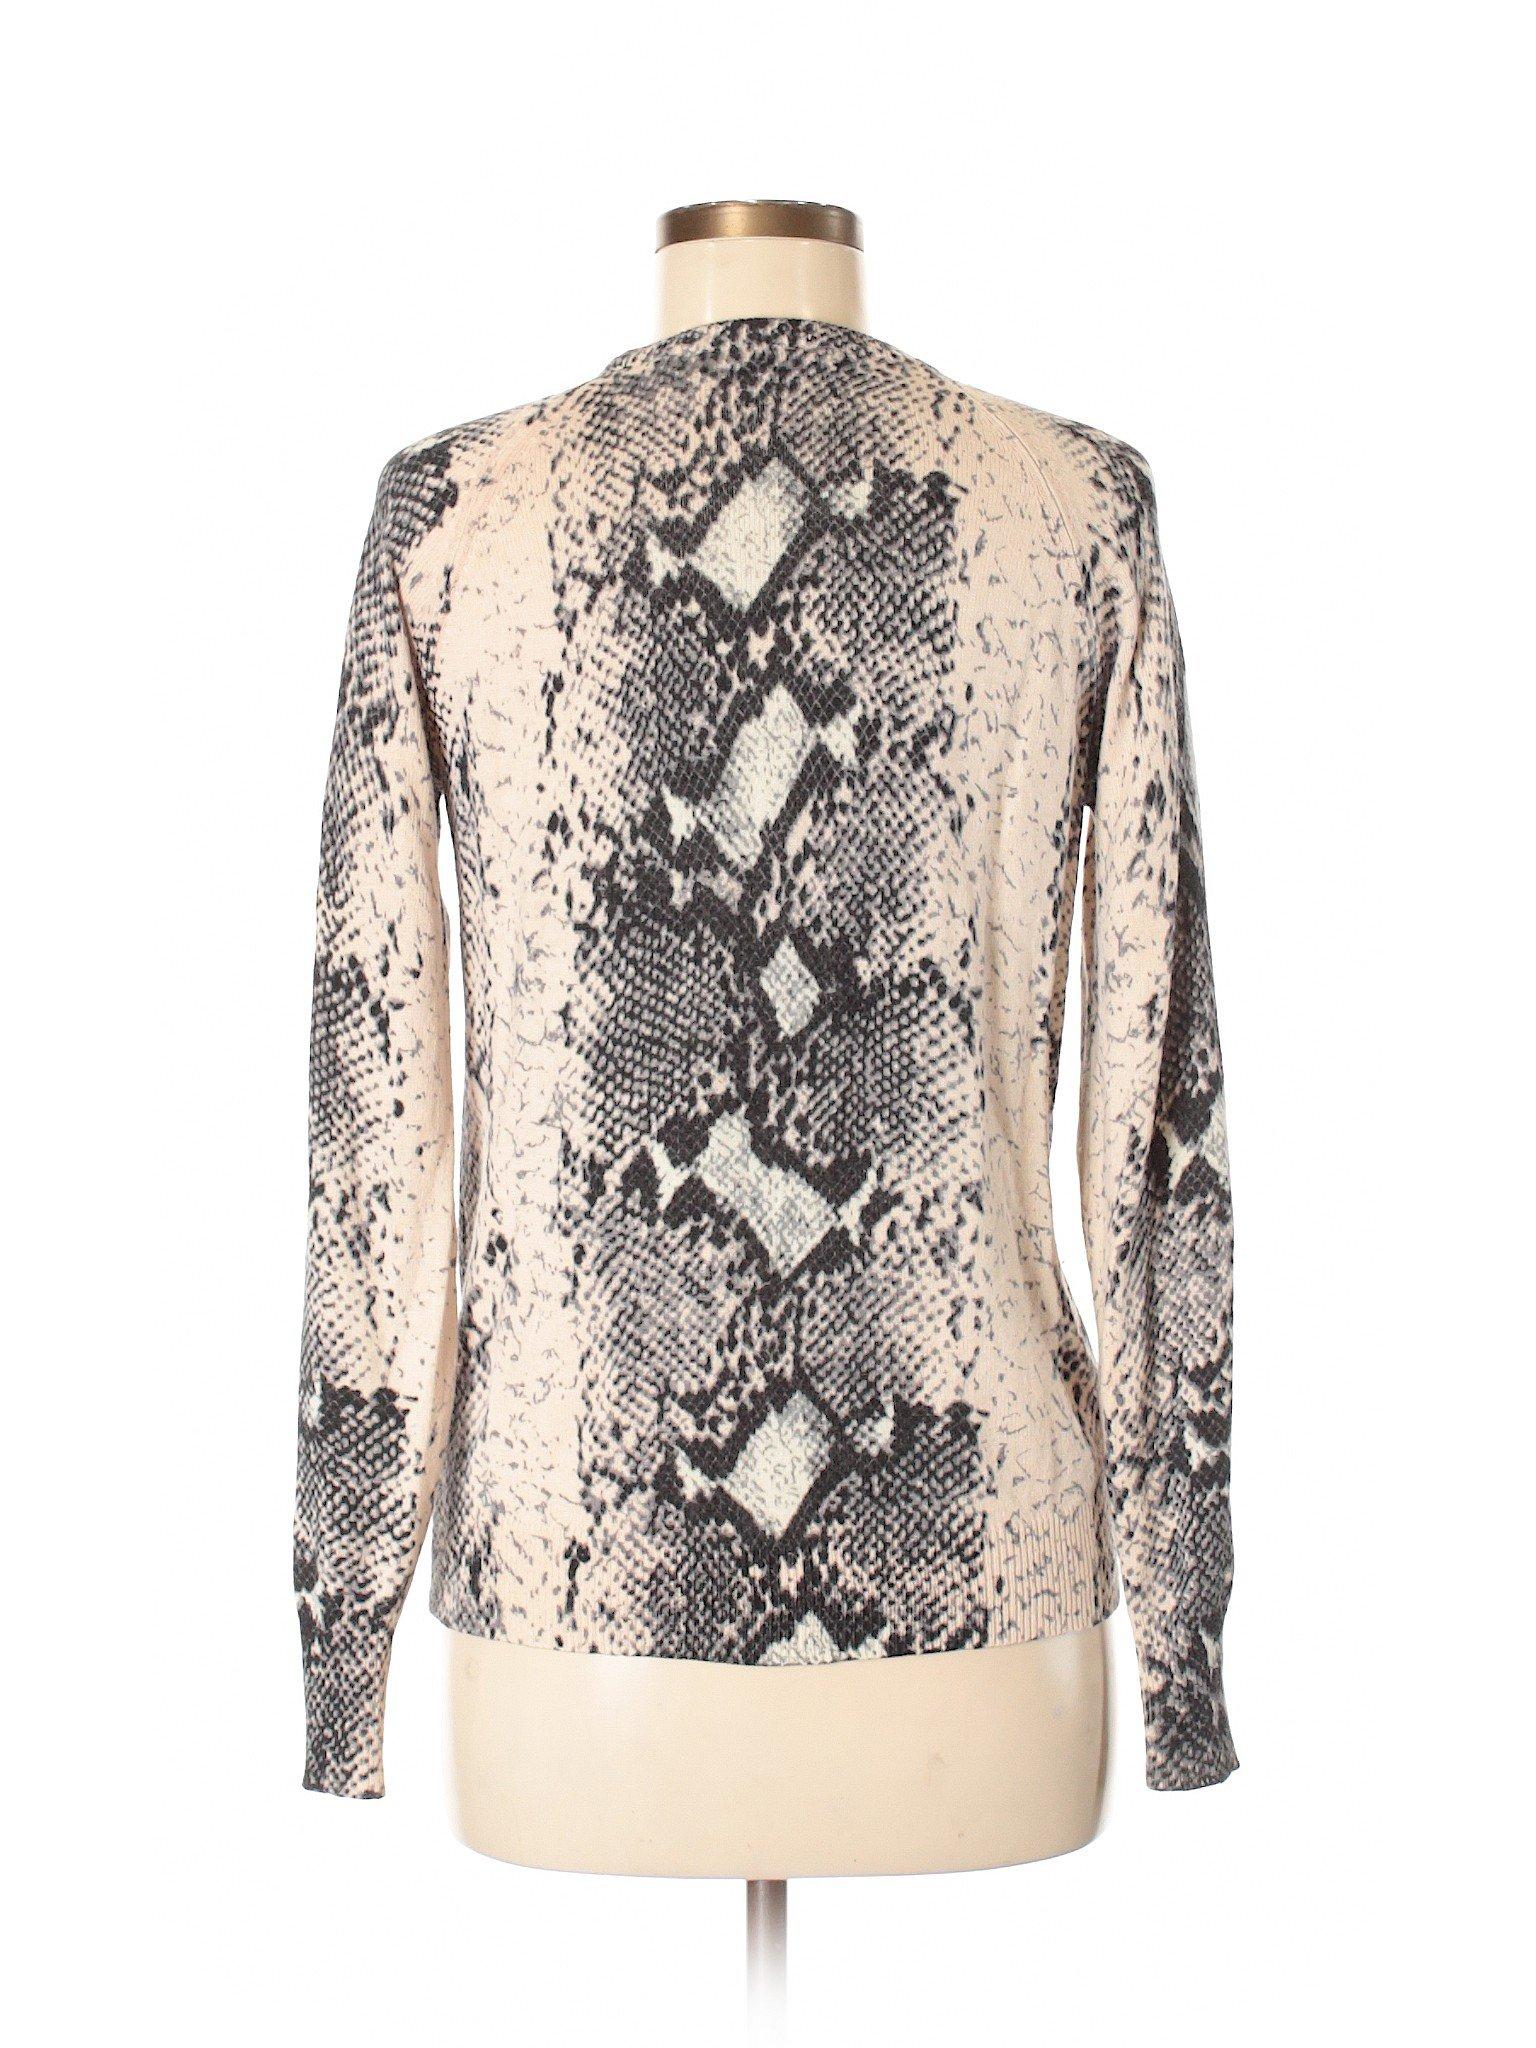 Acrobat Boutique Silk Acrobat Pullover Pullover Silk Sweater Boutique Sweater Boutique Acrobat 0X0rxq75